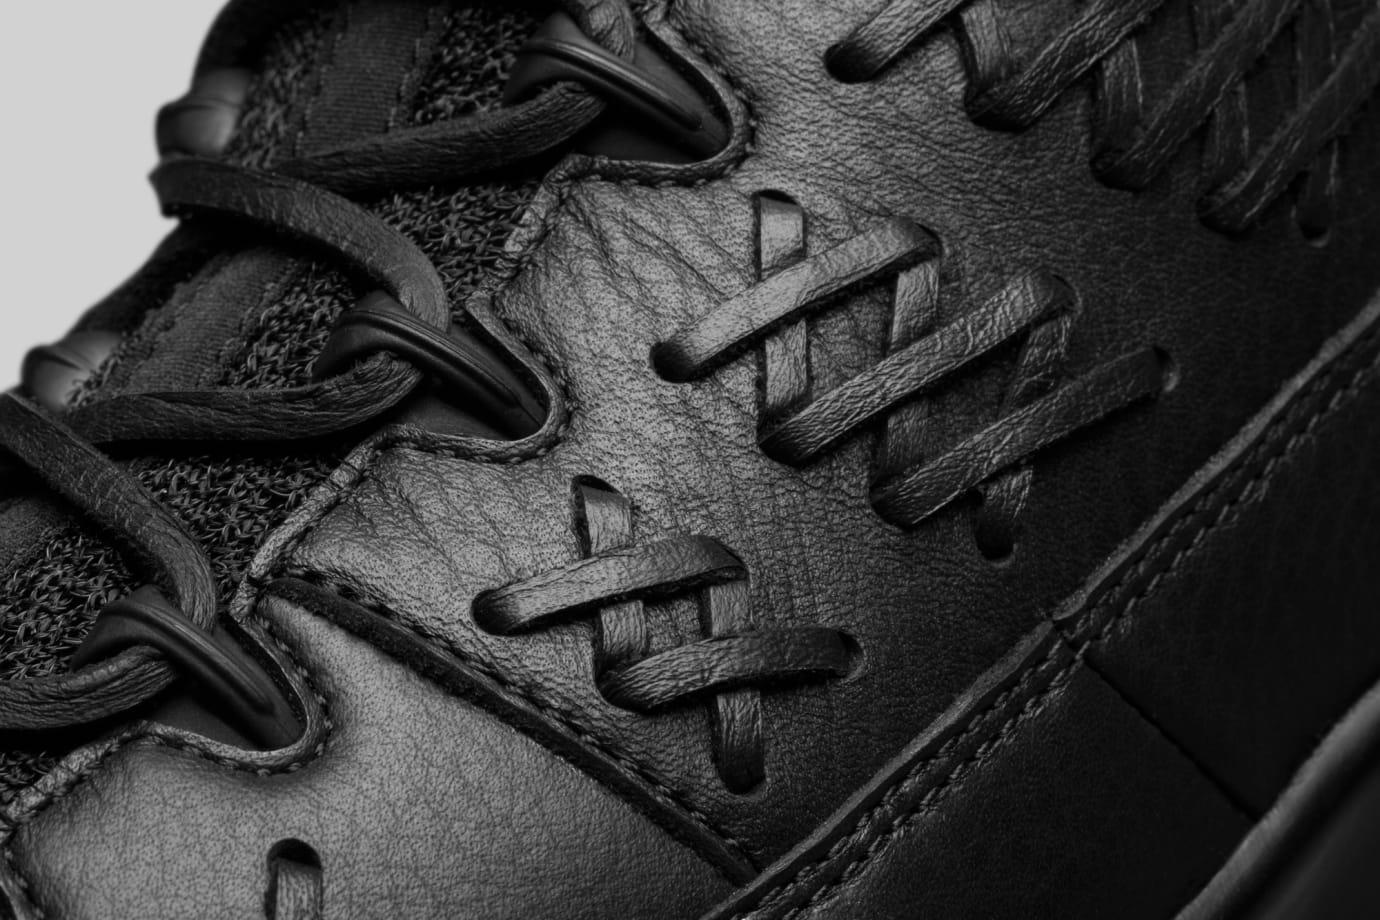 Baseball Air Jordan 9 Black Leather